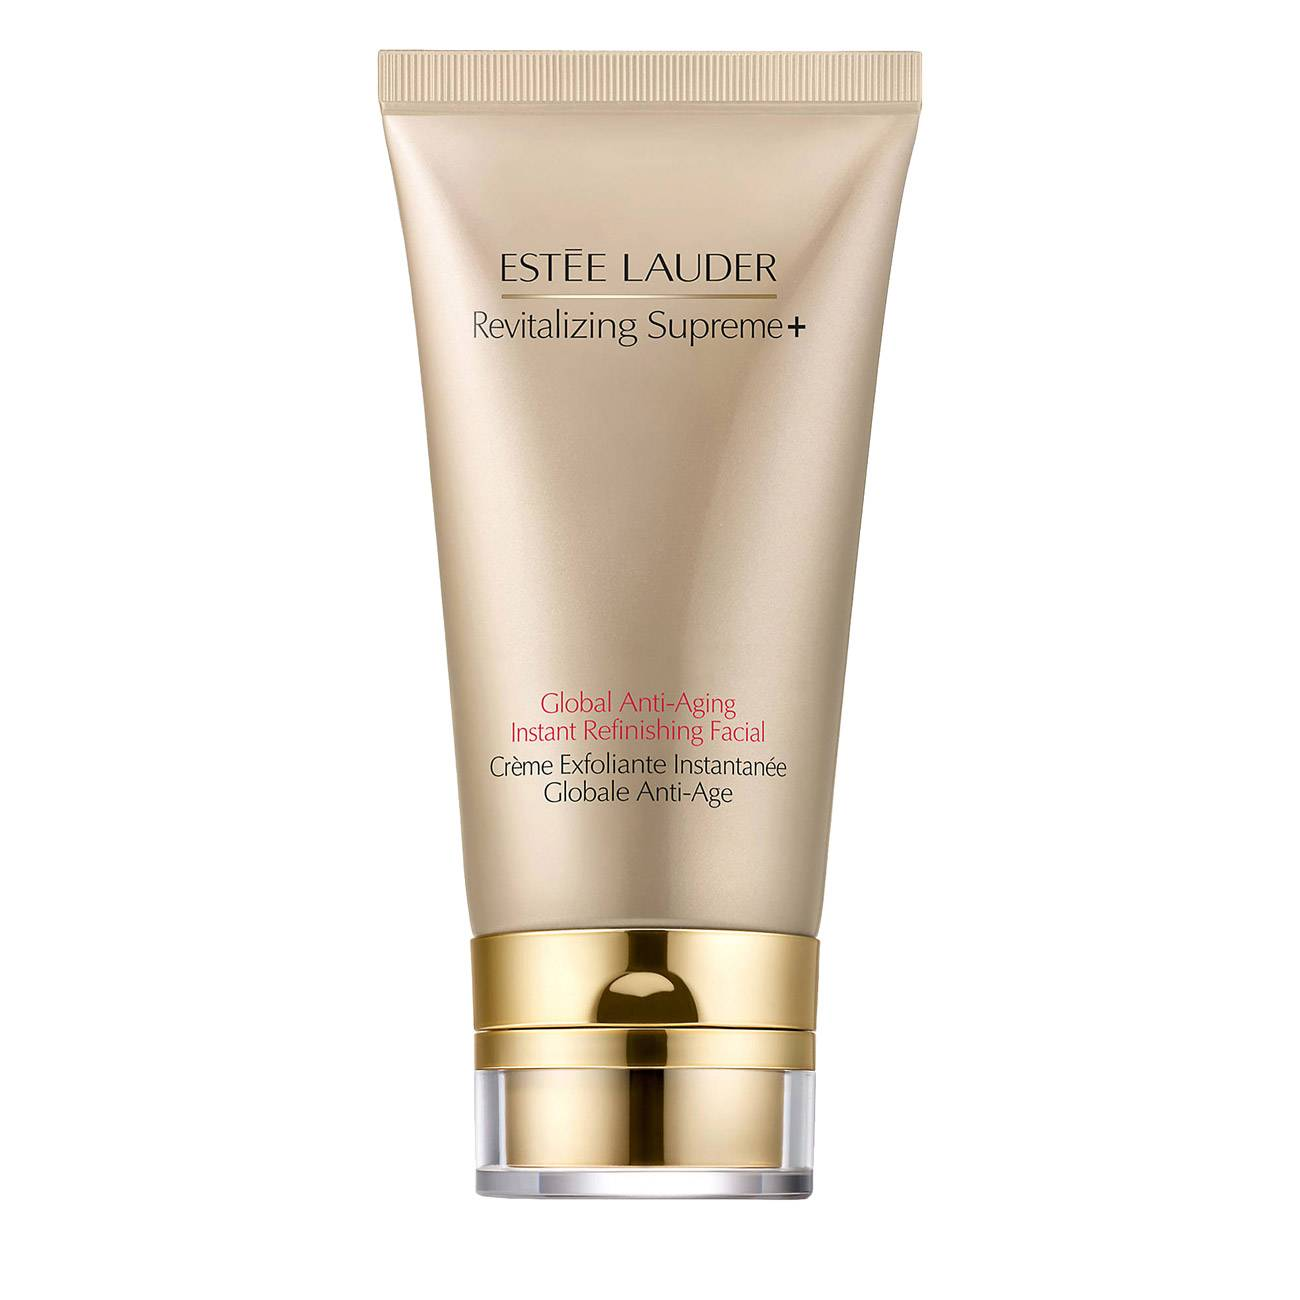 Revitalizing Supreme Instant Refinishing Facial Cleanser 75 Ml Estée Lauder imagine 2021 bestvalue.eu